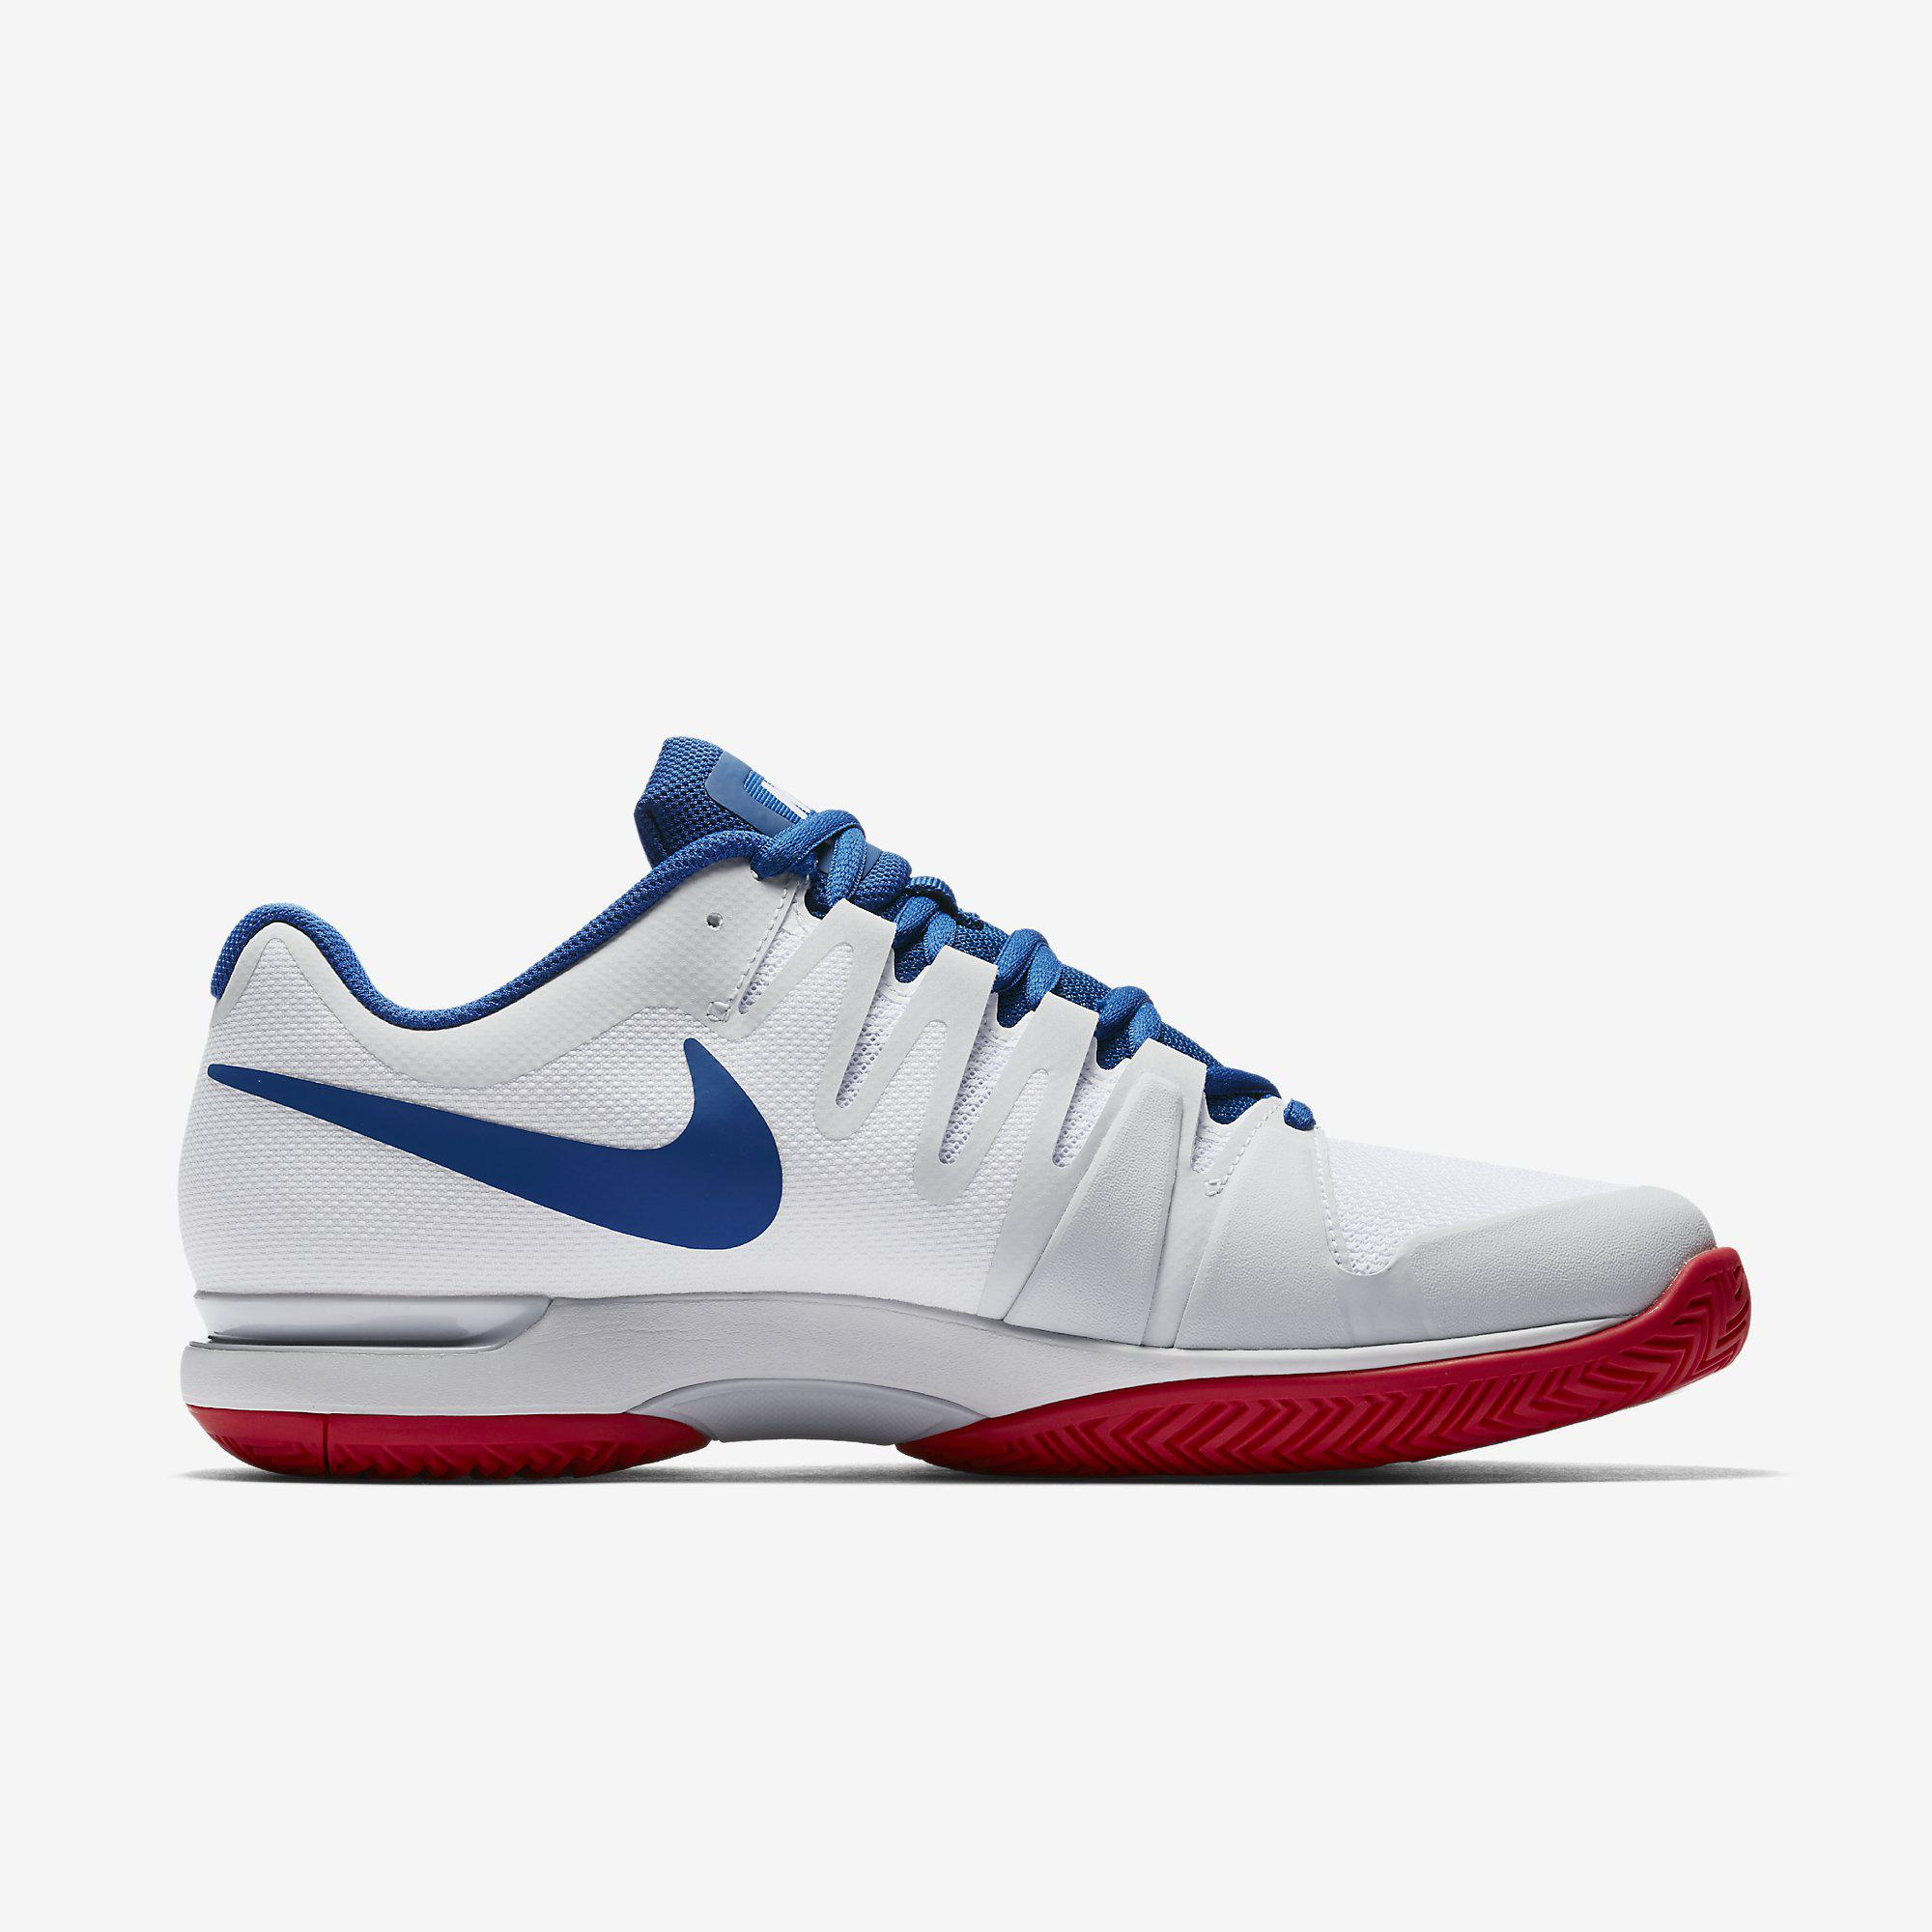 b685895cca077 Nike Mens Zoom Vapor 9.5 Tour Tennis Shoes - White Blue Red ...